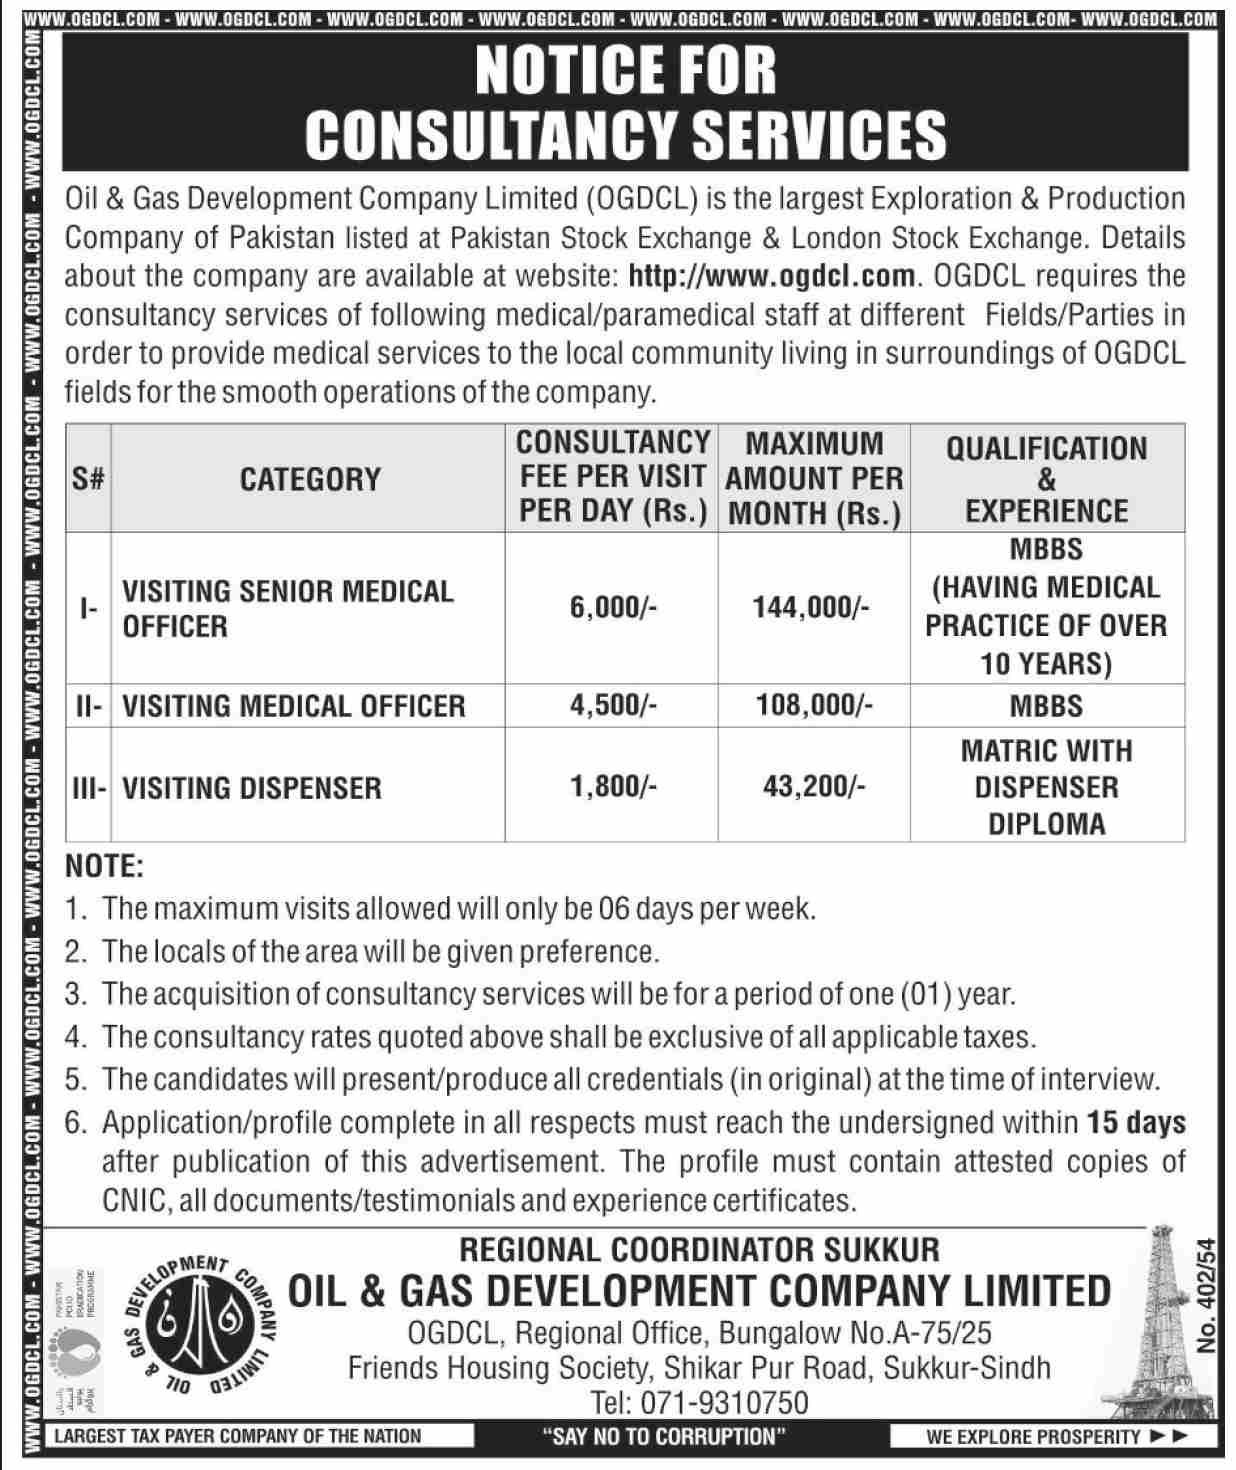 OGDCL Jobs 2021 in Sukkur, Oil & Gas Development Company